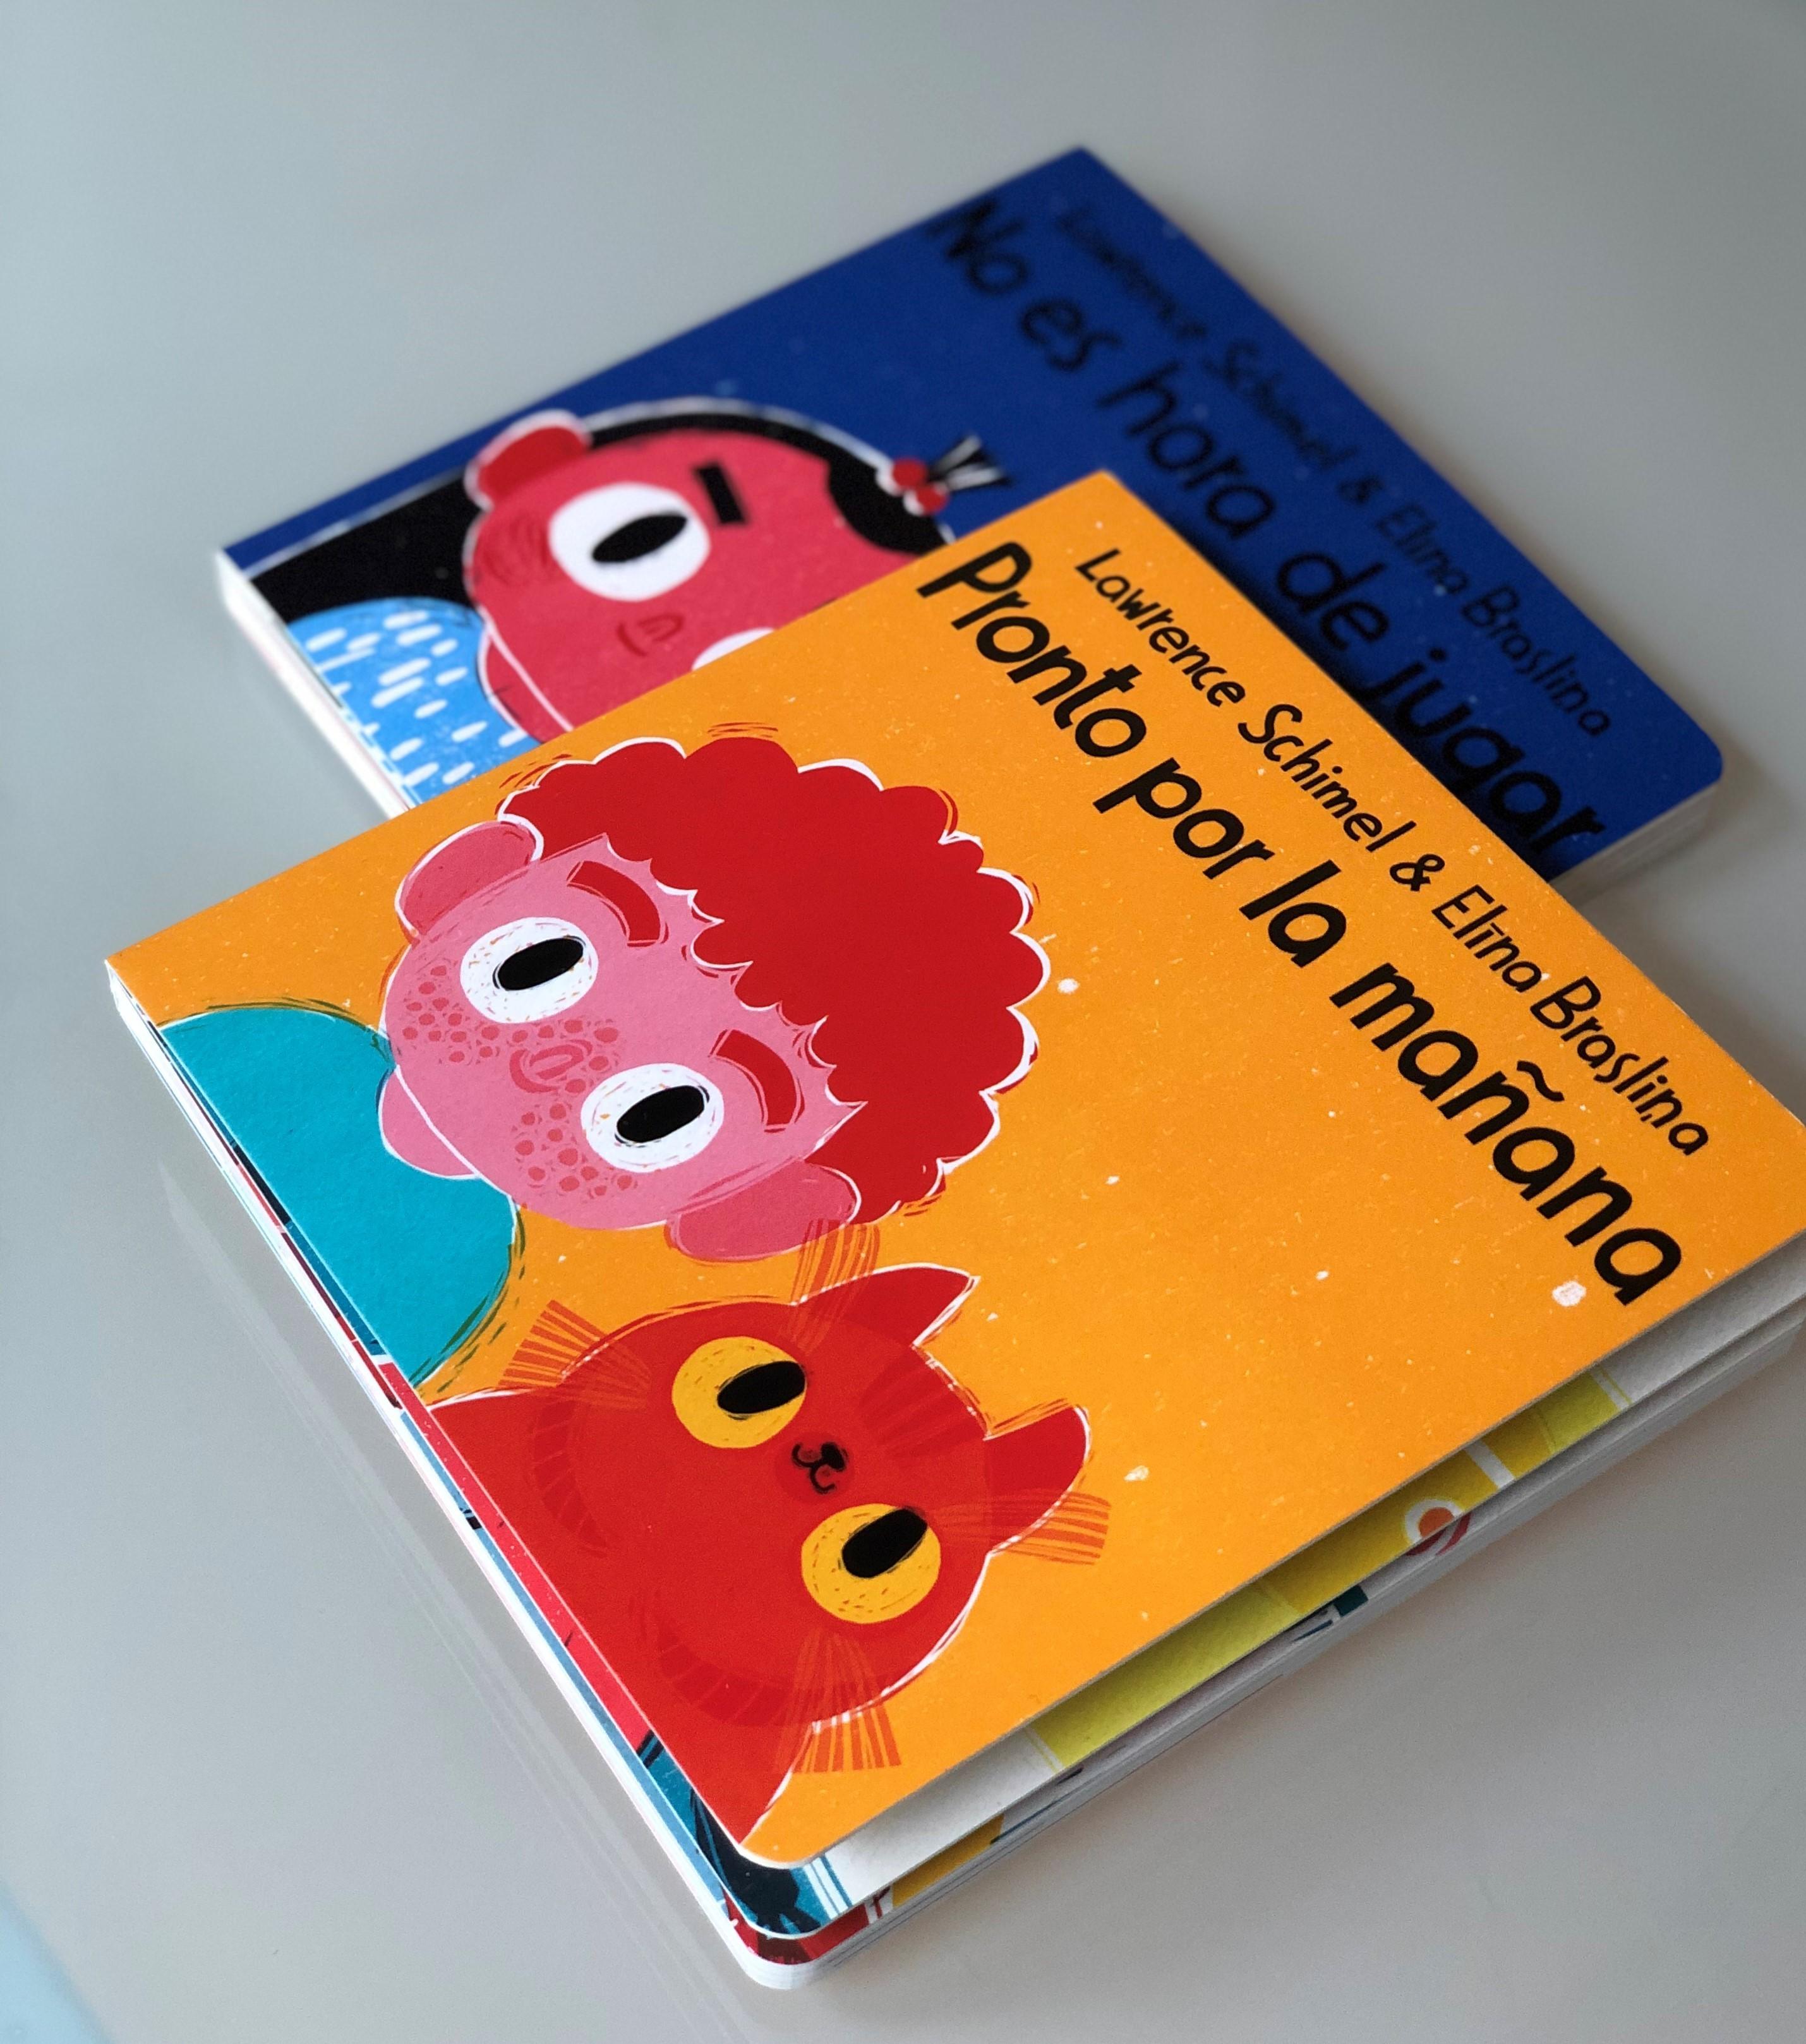 libros infantiles inclusivos